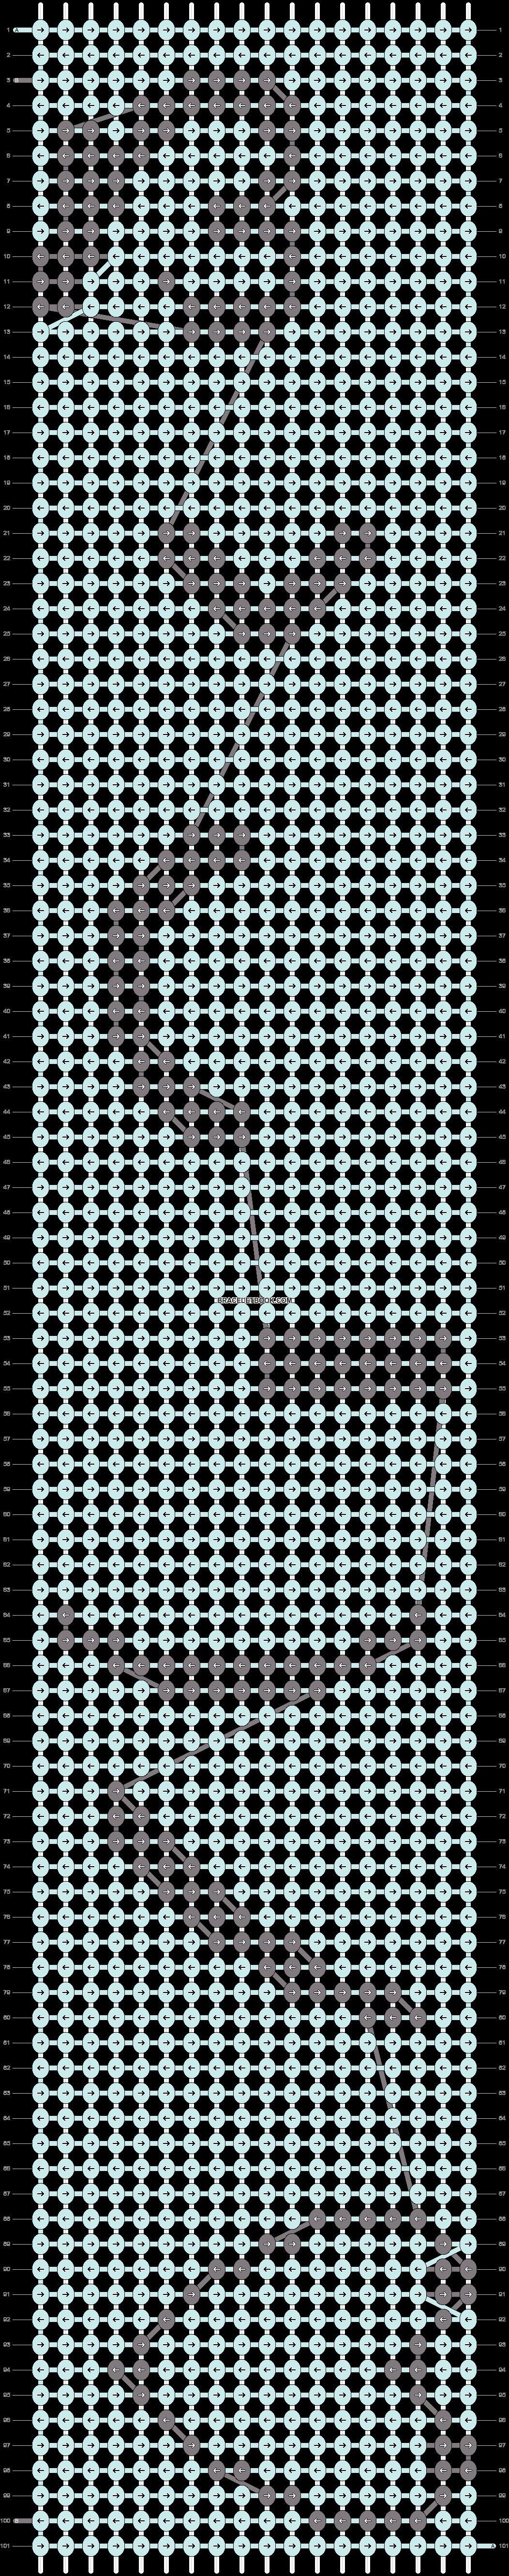 Alpha pattern #86539 pattern